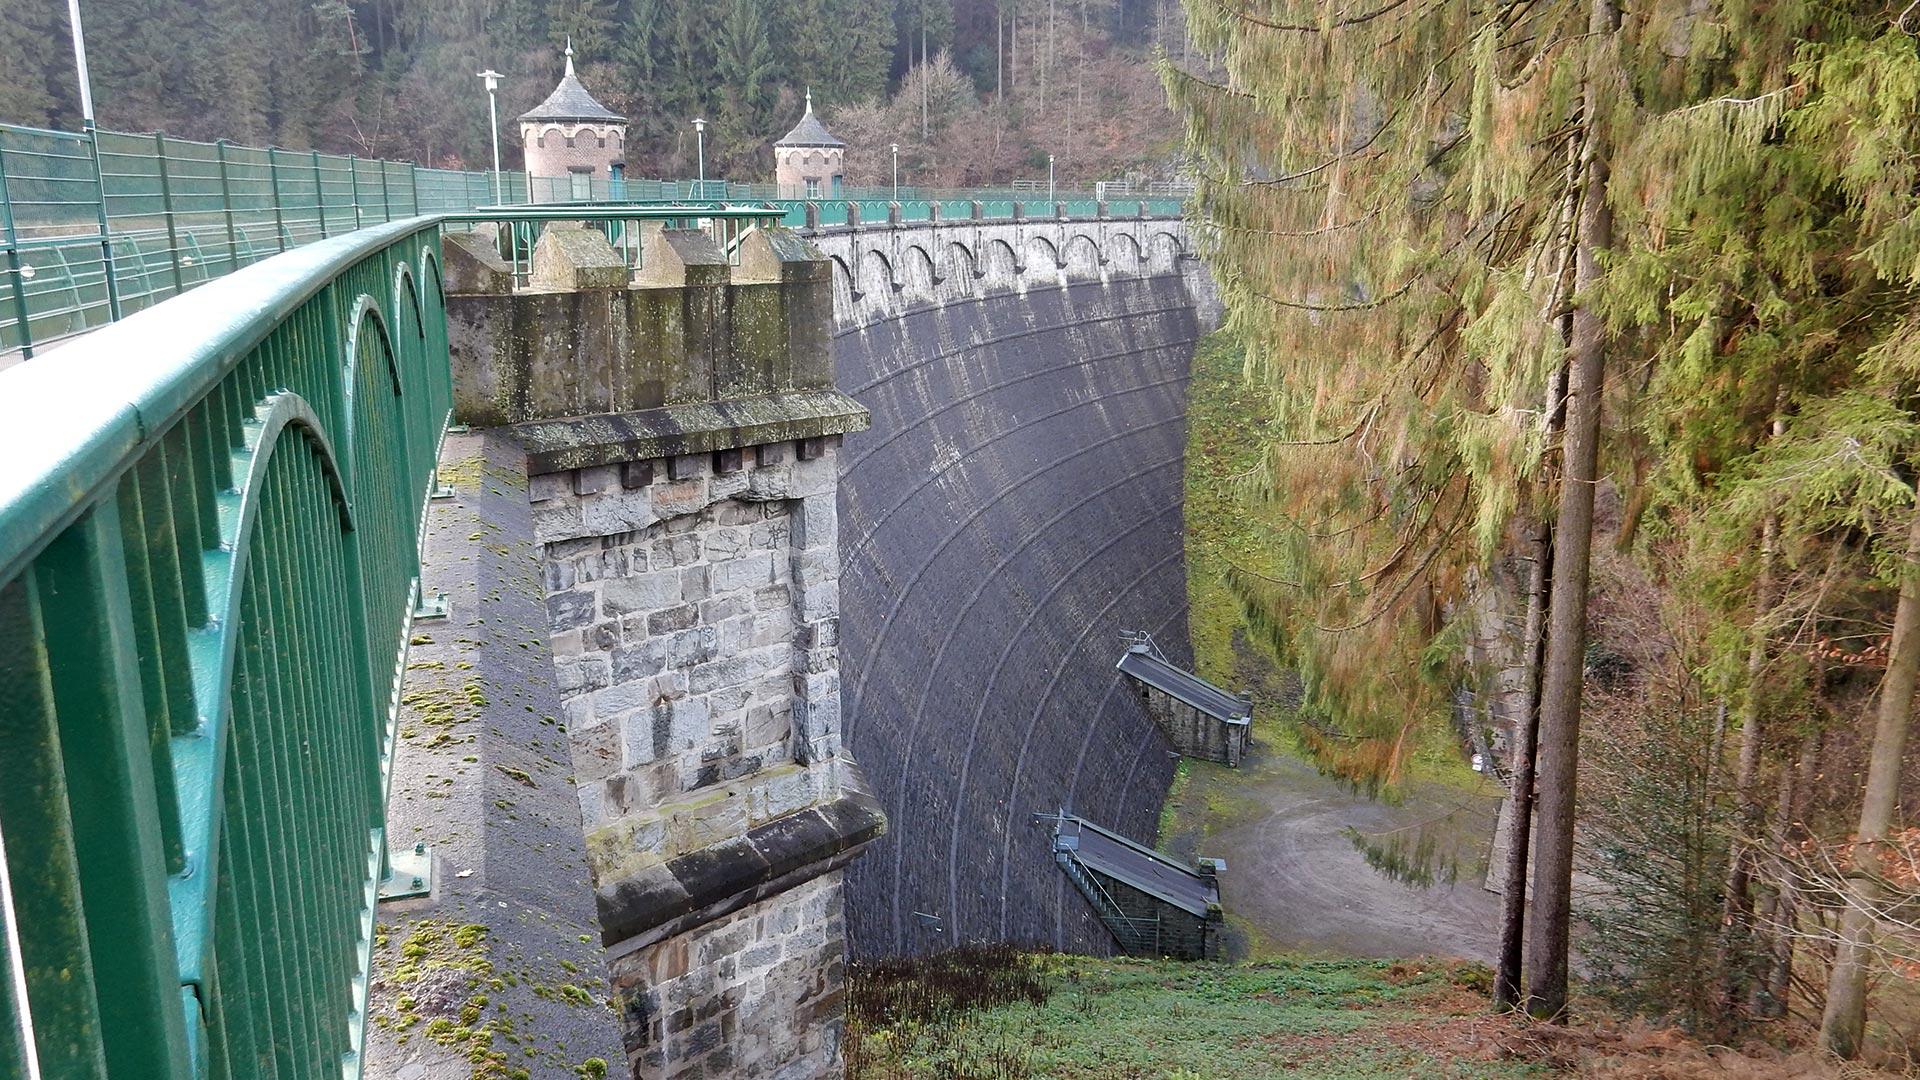 Sengbachtalsperre Solingen, Germany, preservation of drinking water.